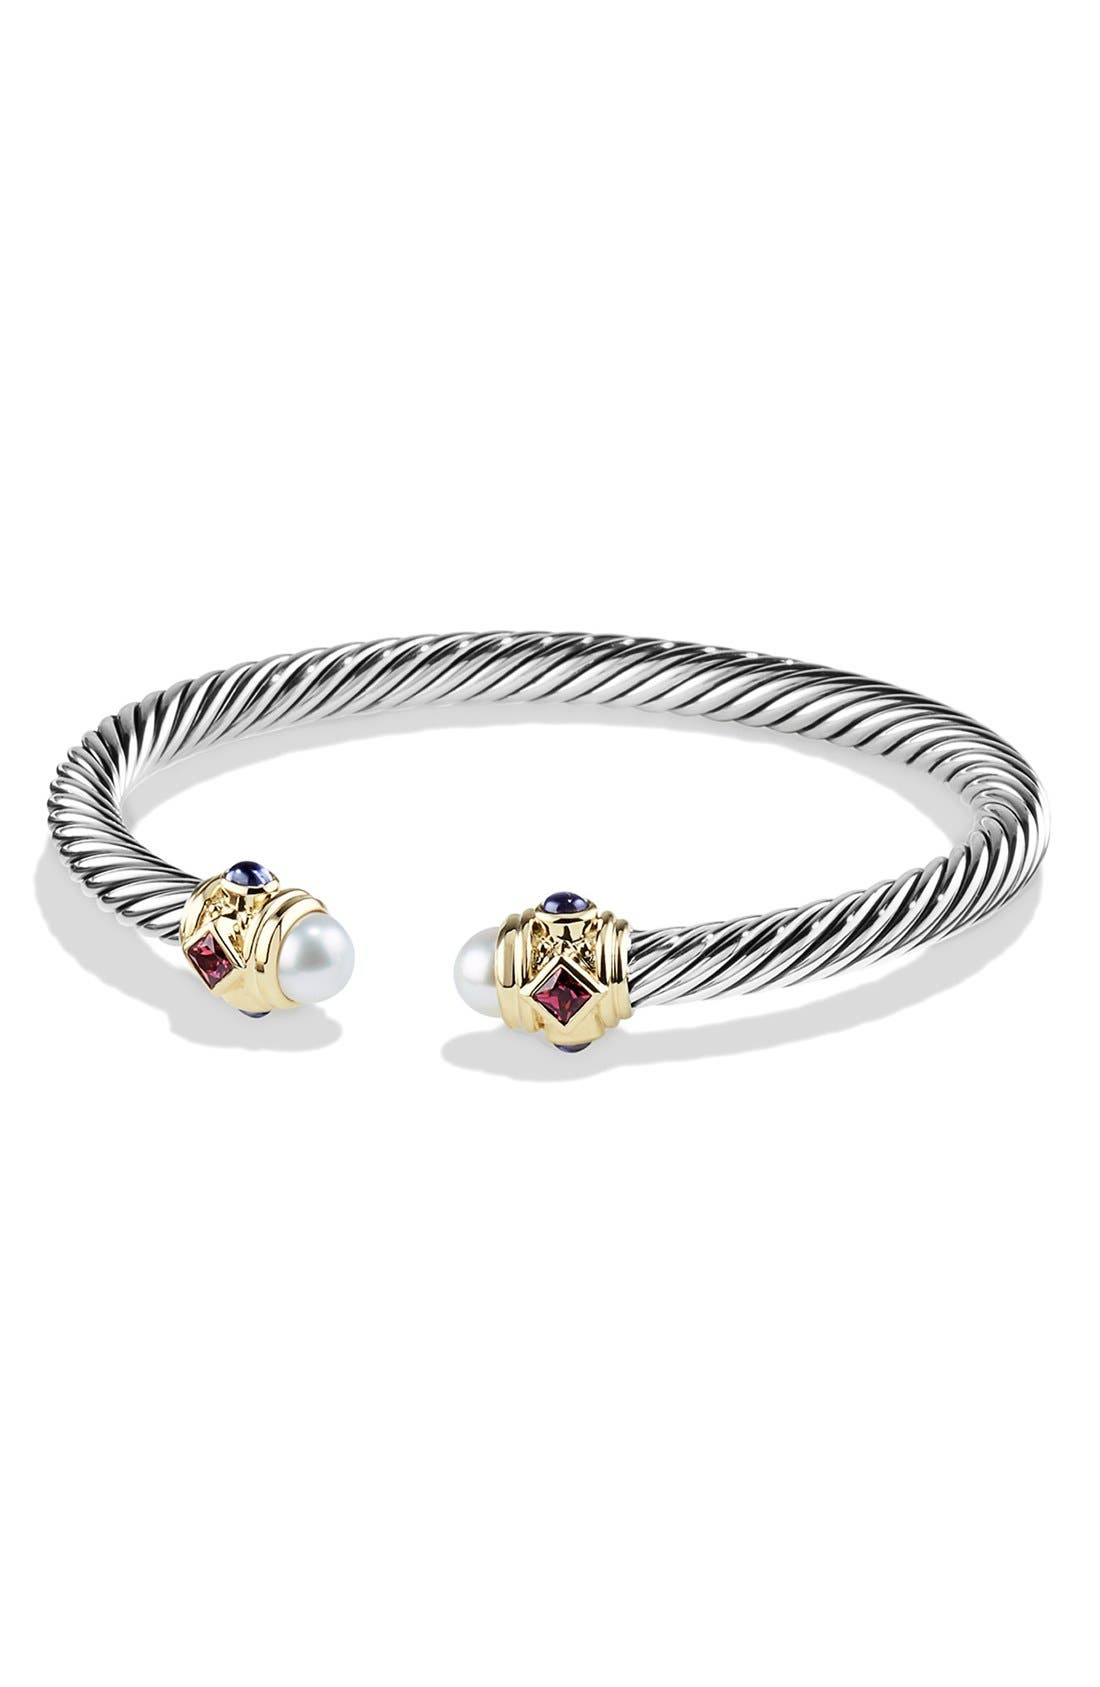 David Yurman 'Renaissance' Bracelet with Semiprecious Stone and 14k Gold